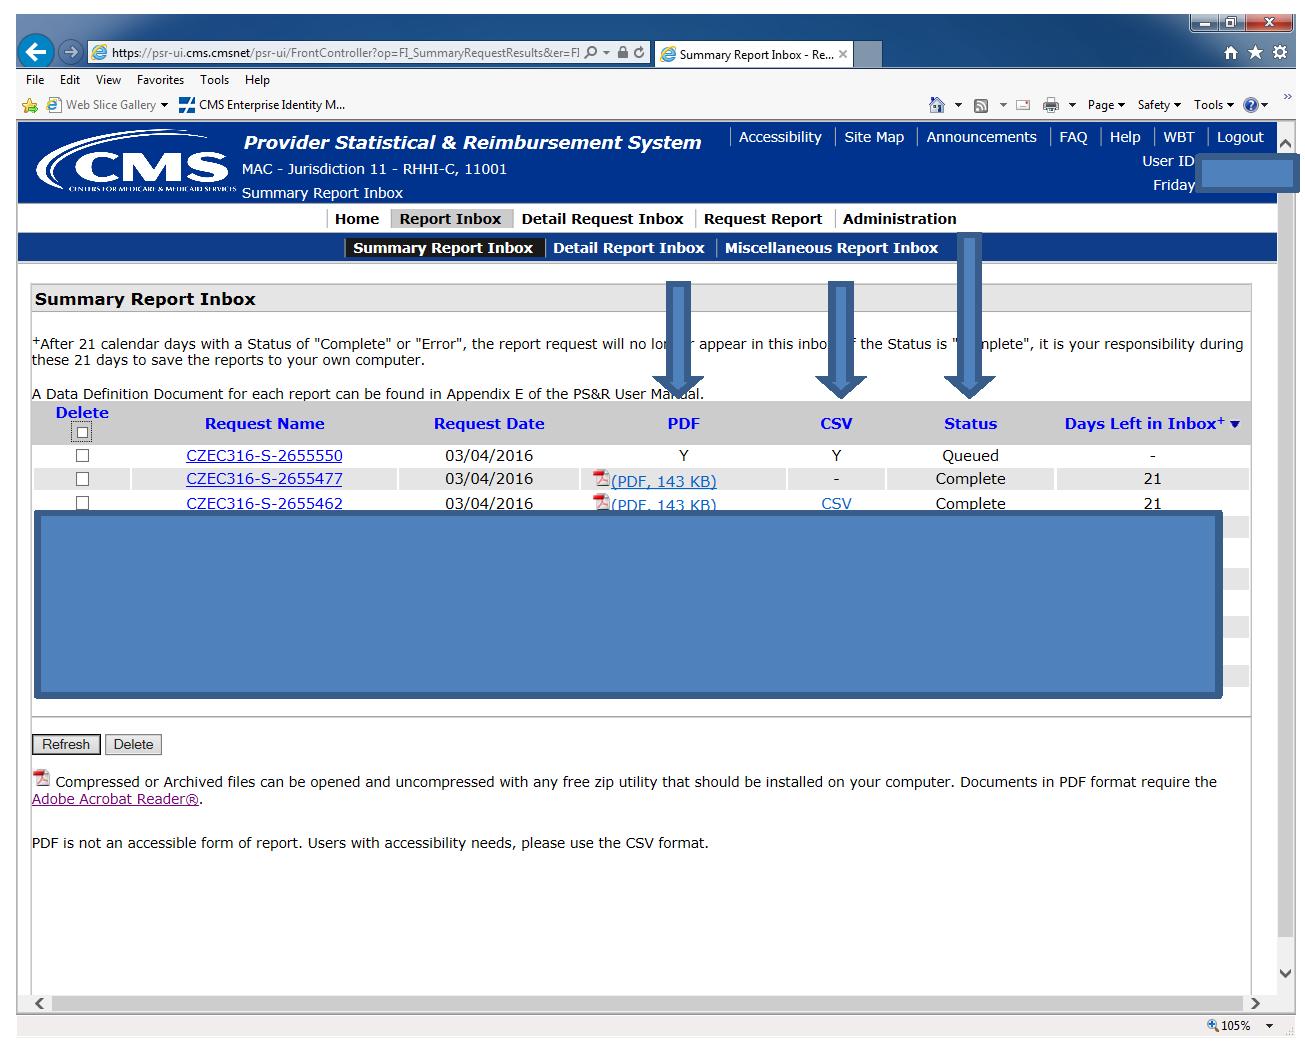 Palmetto GBA - JM Part A - Audit and Reimbursement